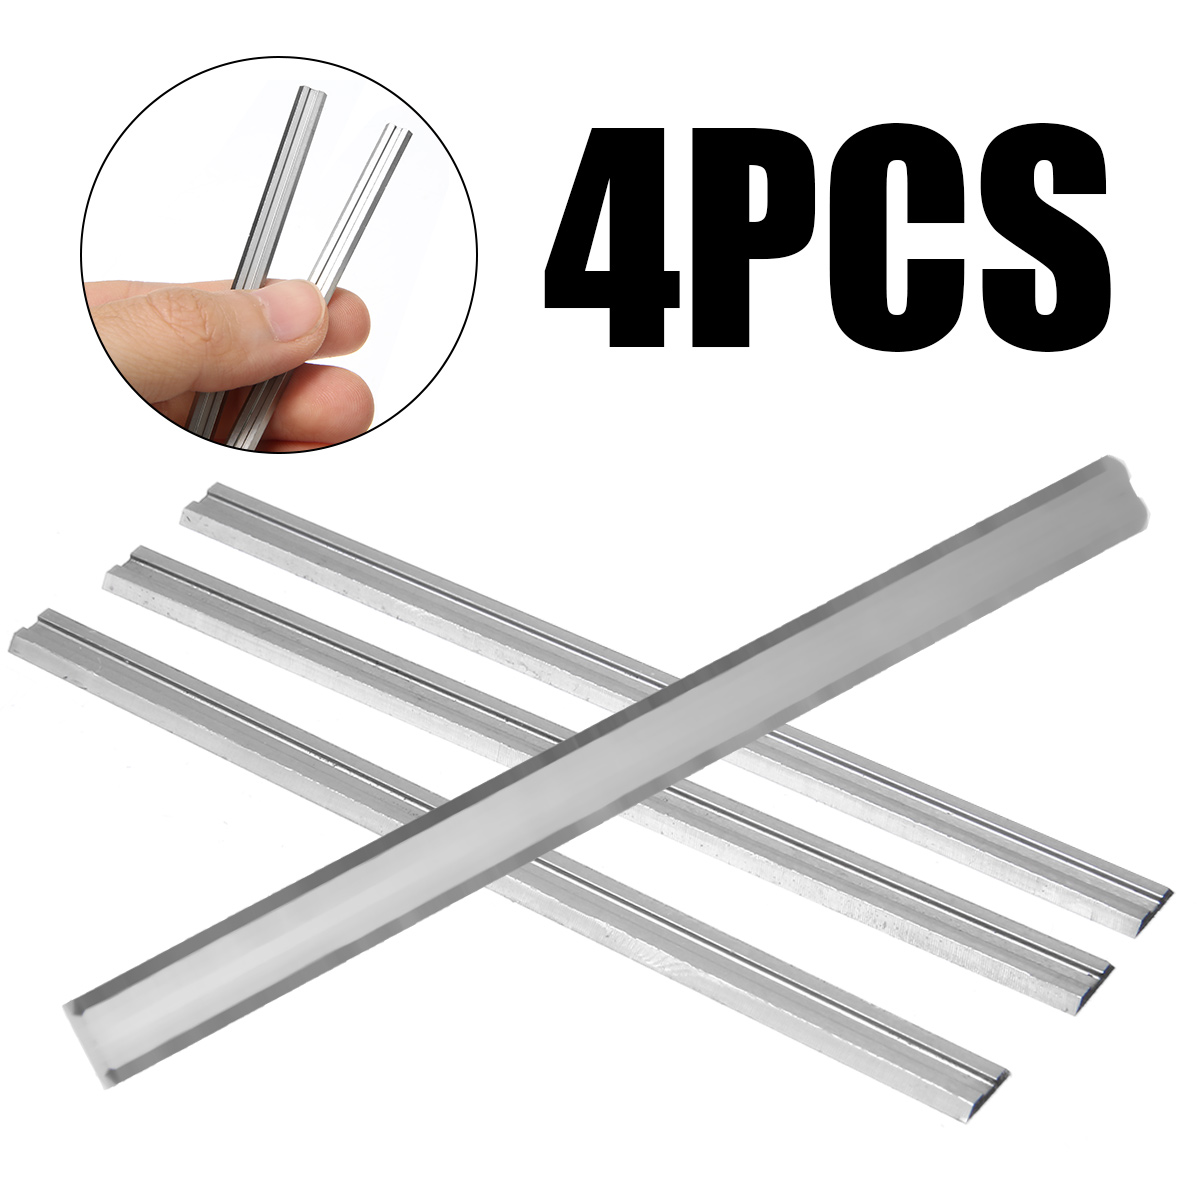 4pcs Planer Knife Planer Blades Knife 82mm PHO 25-82 / PHO 200 / PHO 16-82 / HM B34 Carbide  82*5.5*1.1mm Mayitr